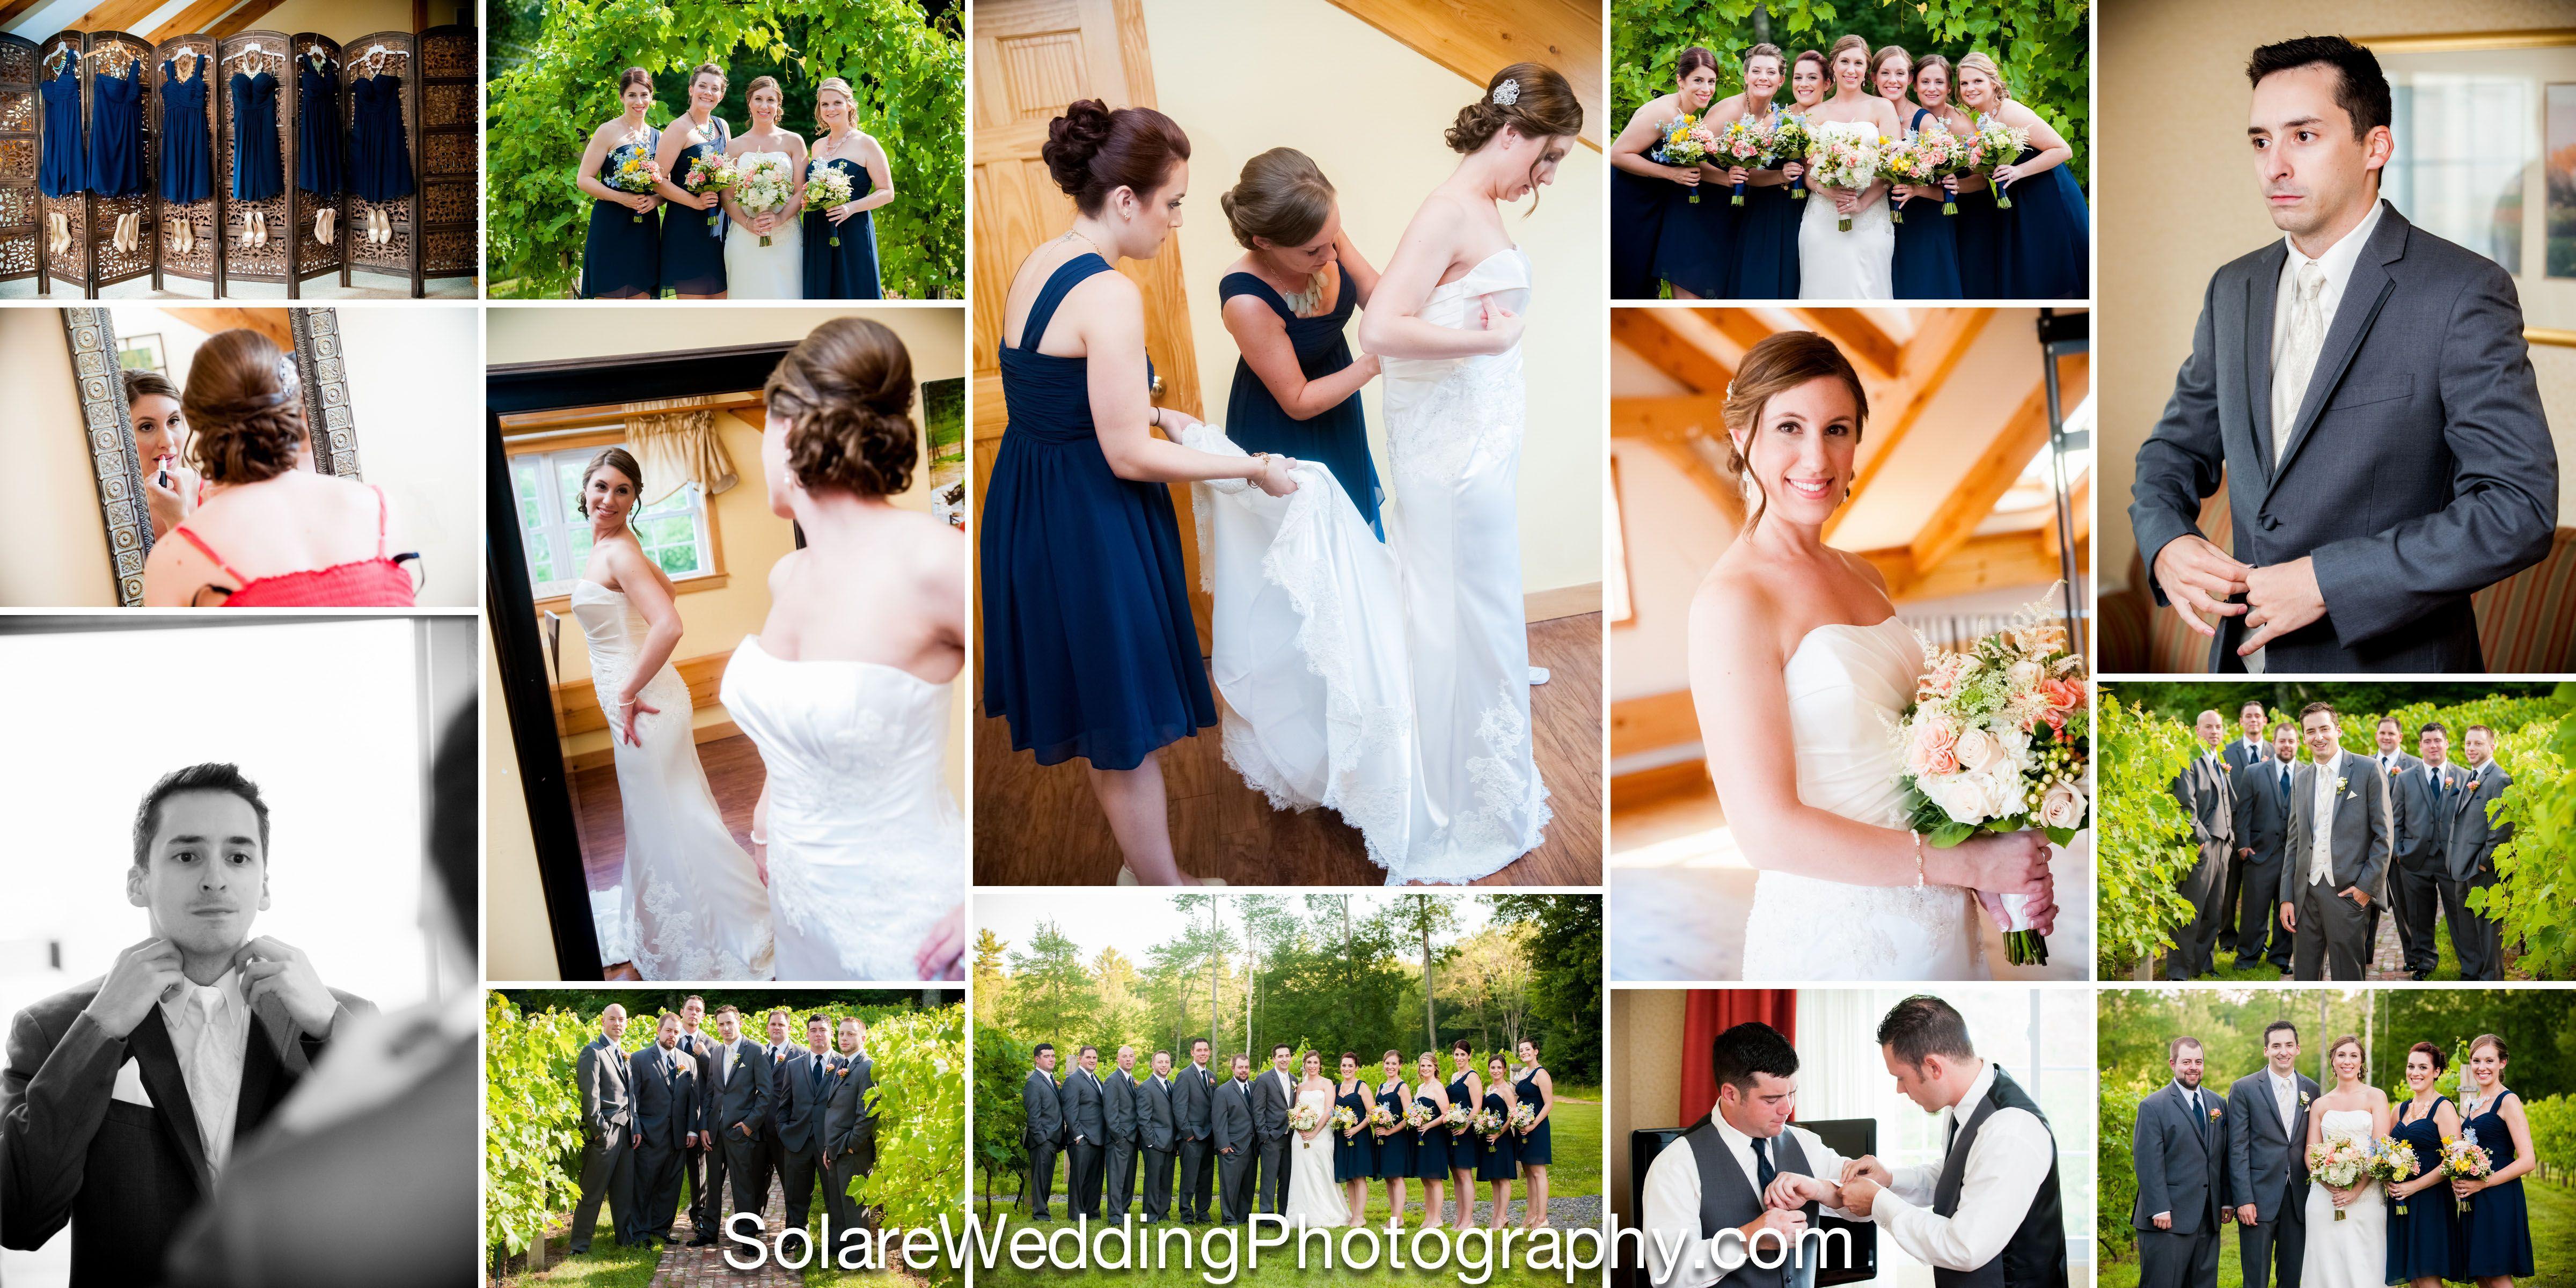 Wedding Photography At Zorvino Vineyards In Sandown Nh New Hampshire Wedding Photographers Vineyard Wedding Wedding Photography Colorado Wedding Planner